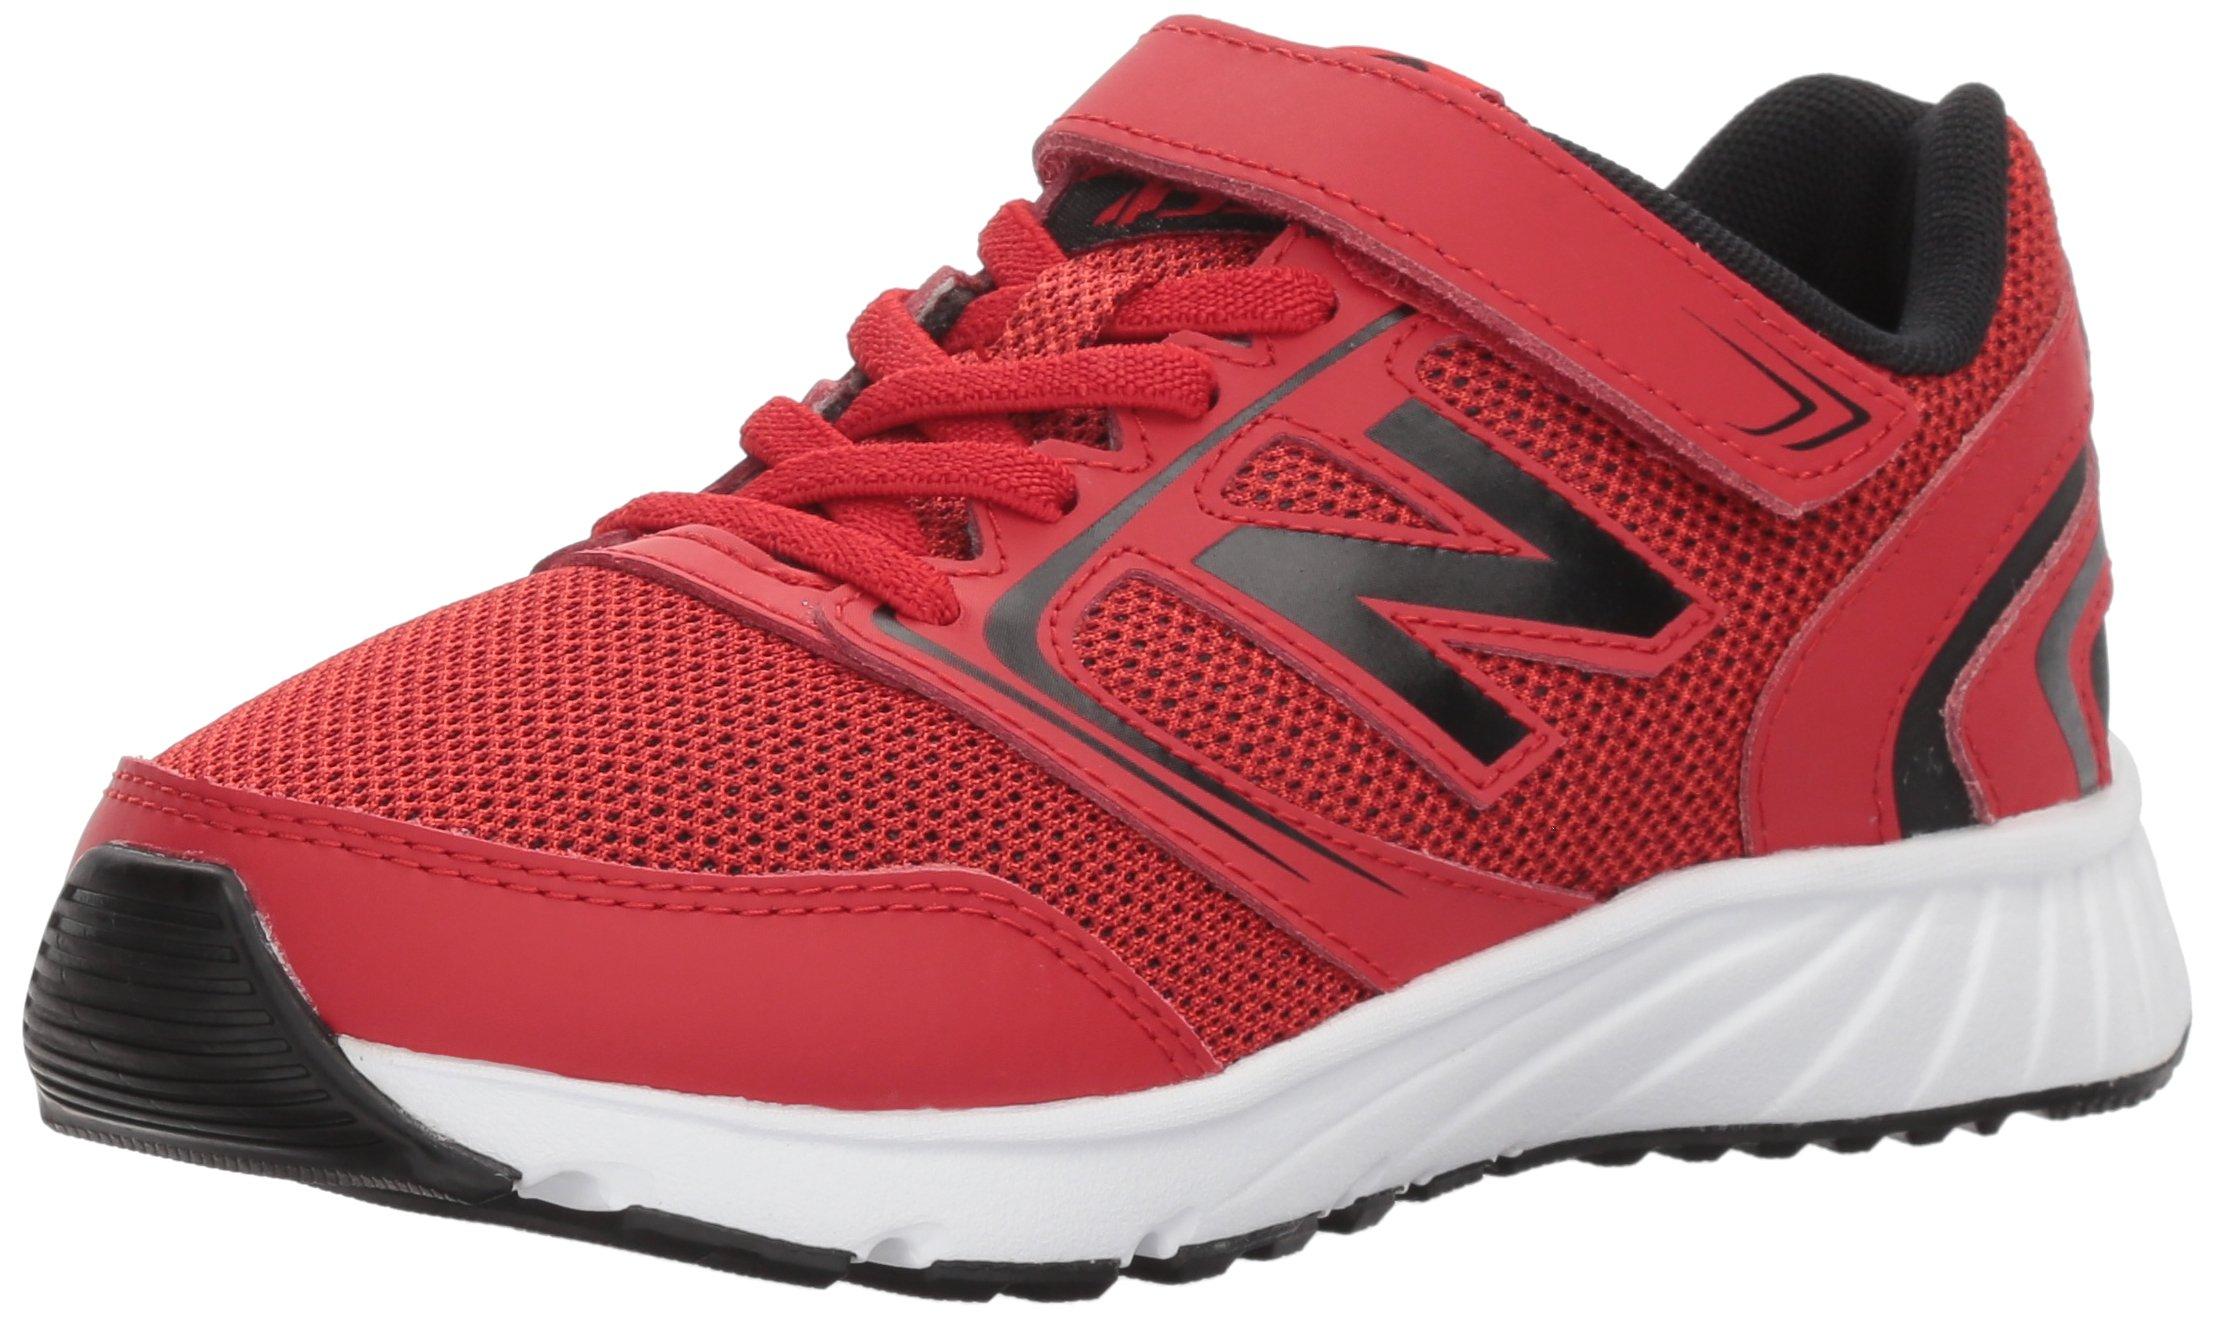 New Balance Boys' 455v1 Hook and Loop Running Shoe, Team Red/Black, 4 W US Big Kid